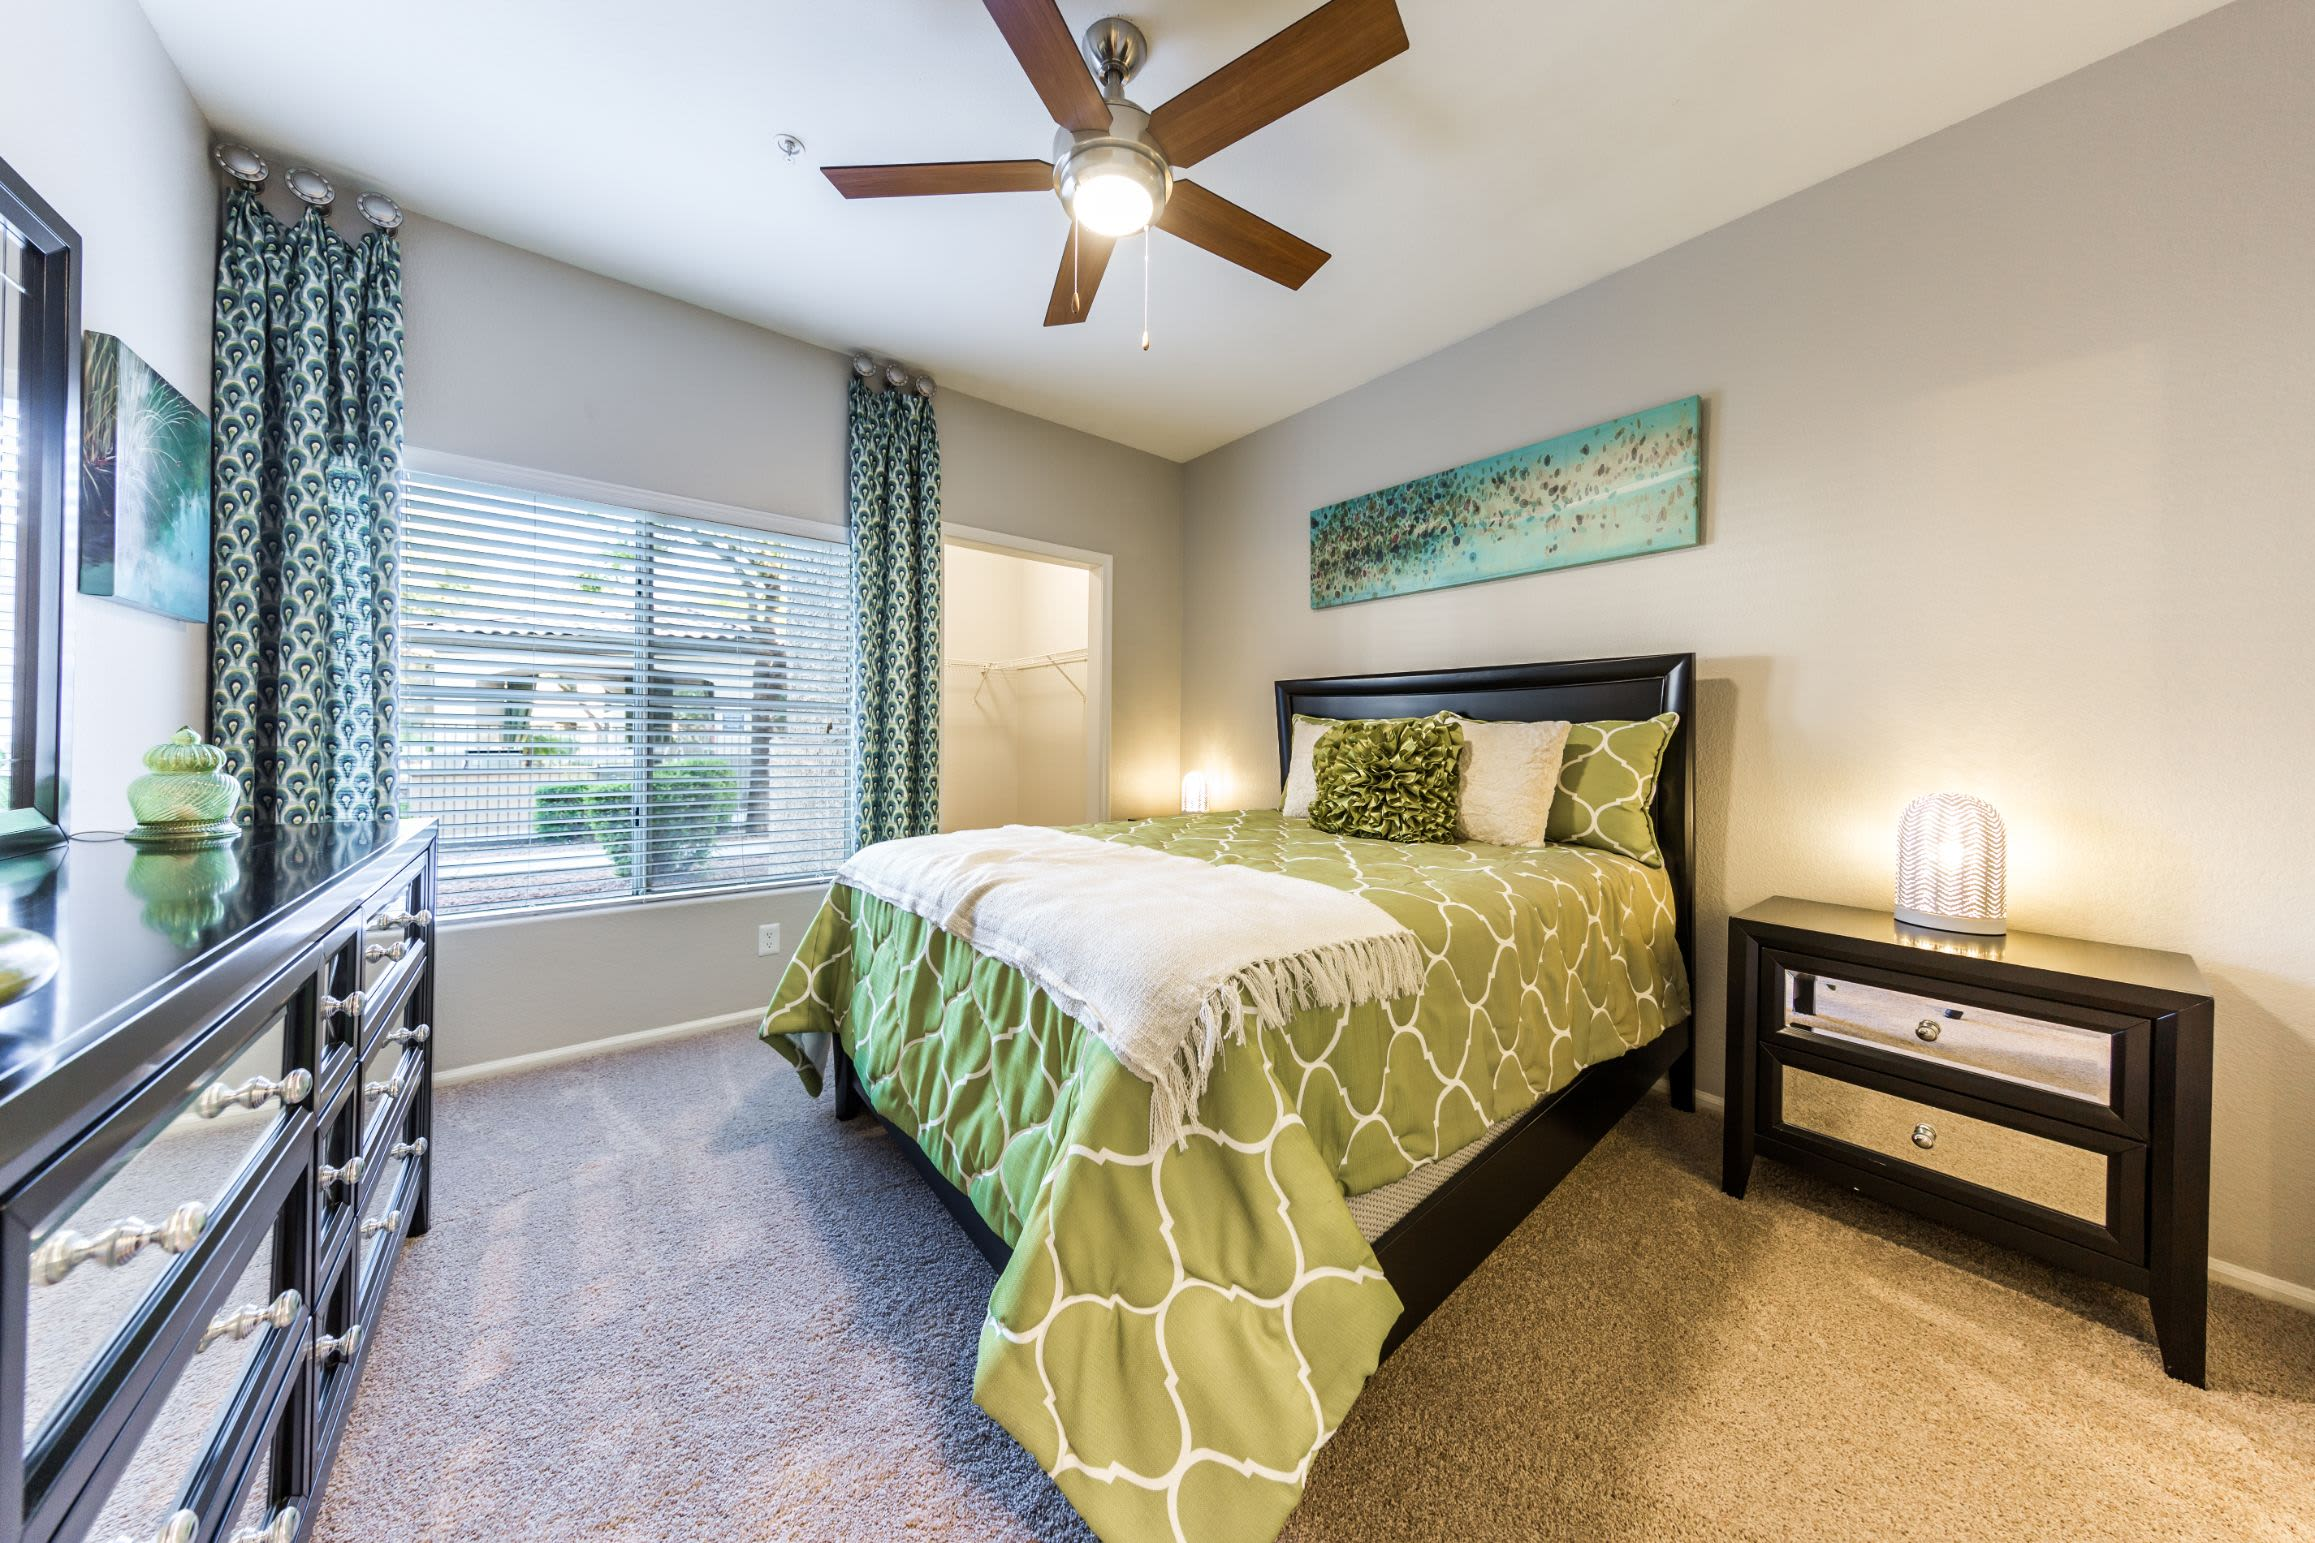 Bedroom with carpet flooring at Marquis at Arrowhead in Peoria, Arizona